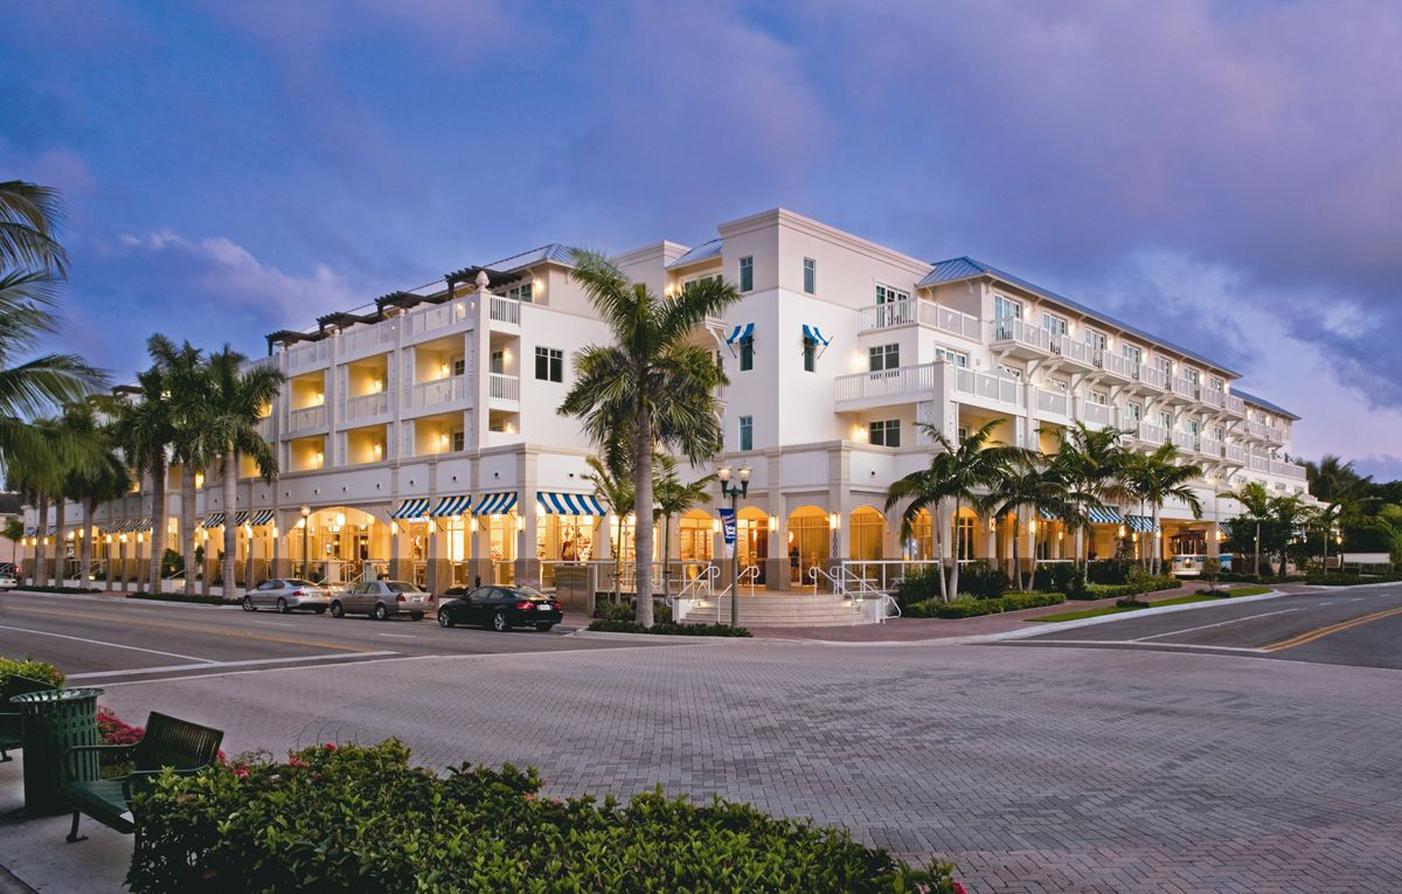 delray beach resorts the seagate hotel spa luxury. Black Bedroom Furniture Sets. Home Design Ideas